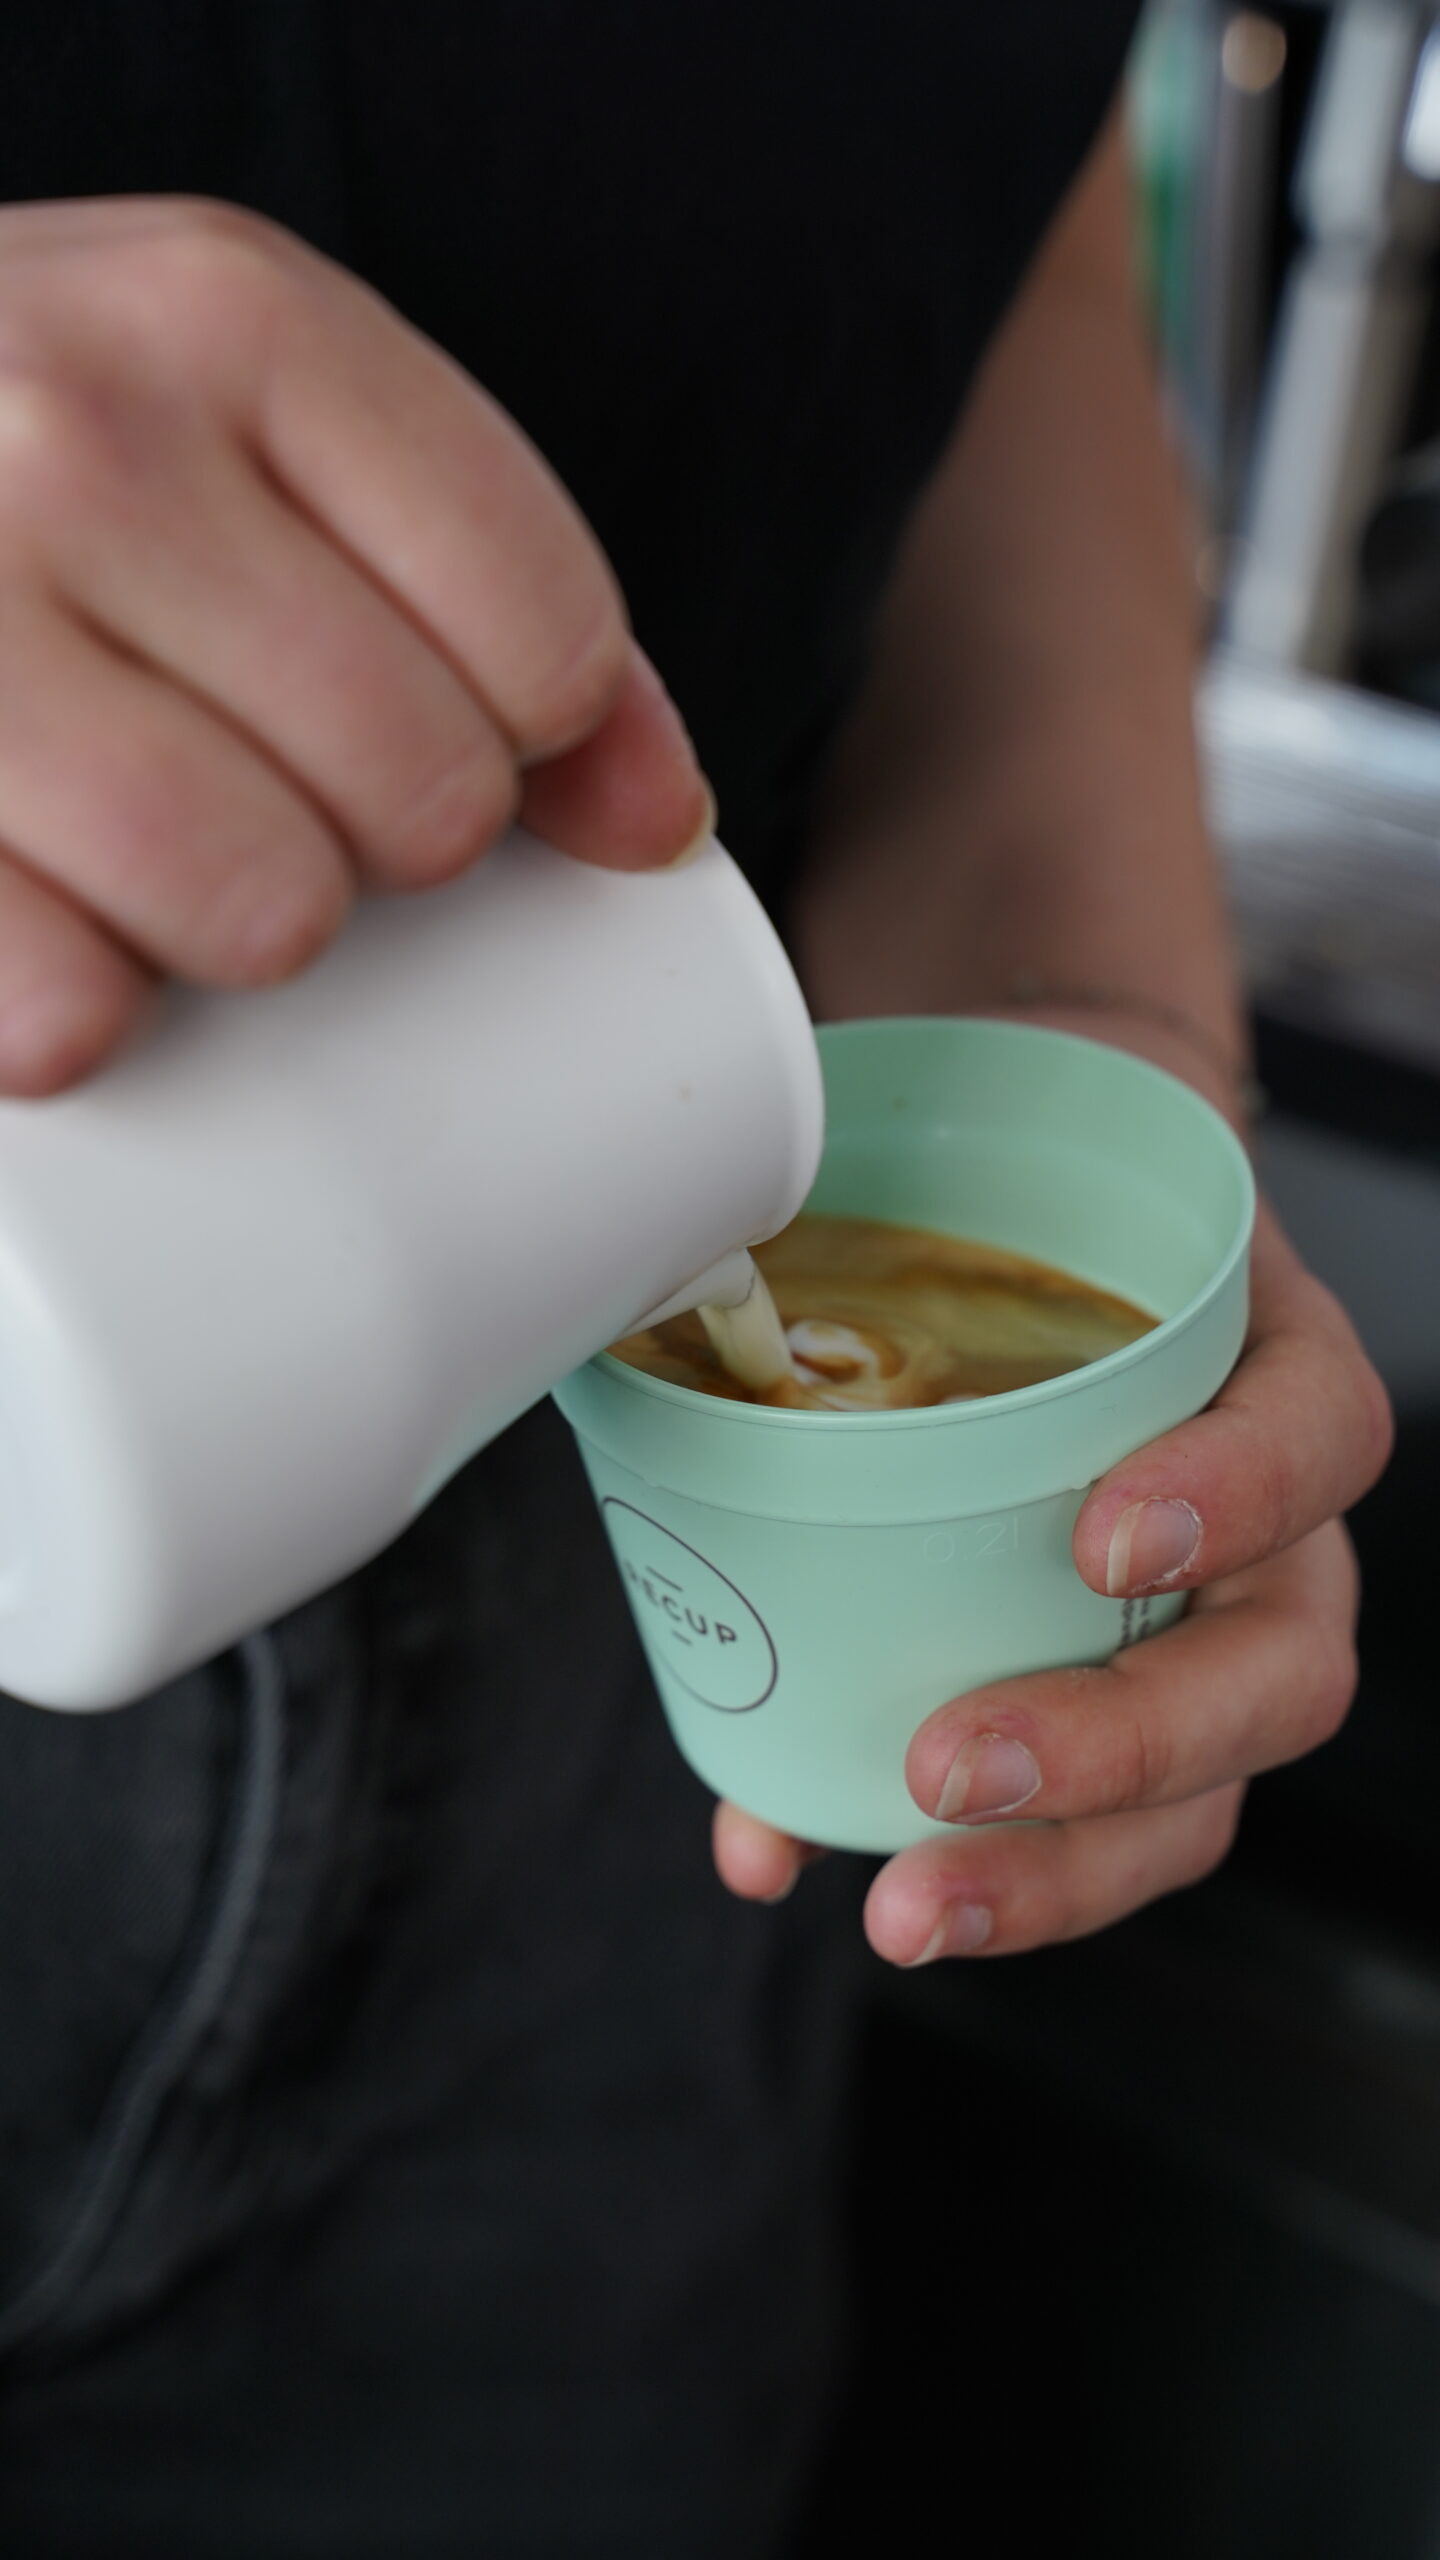 Cappuccinozubereitung im Recup-Becher